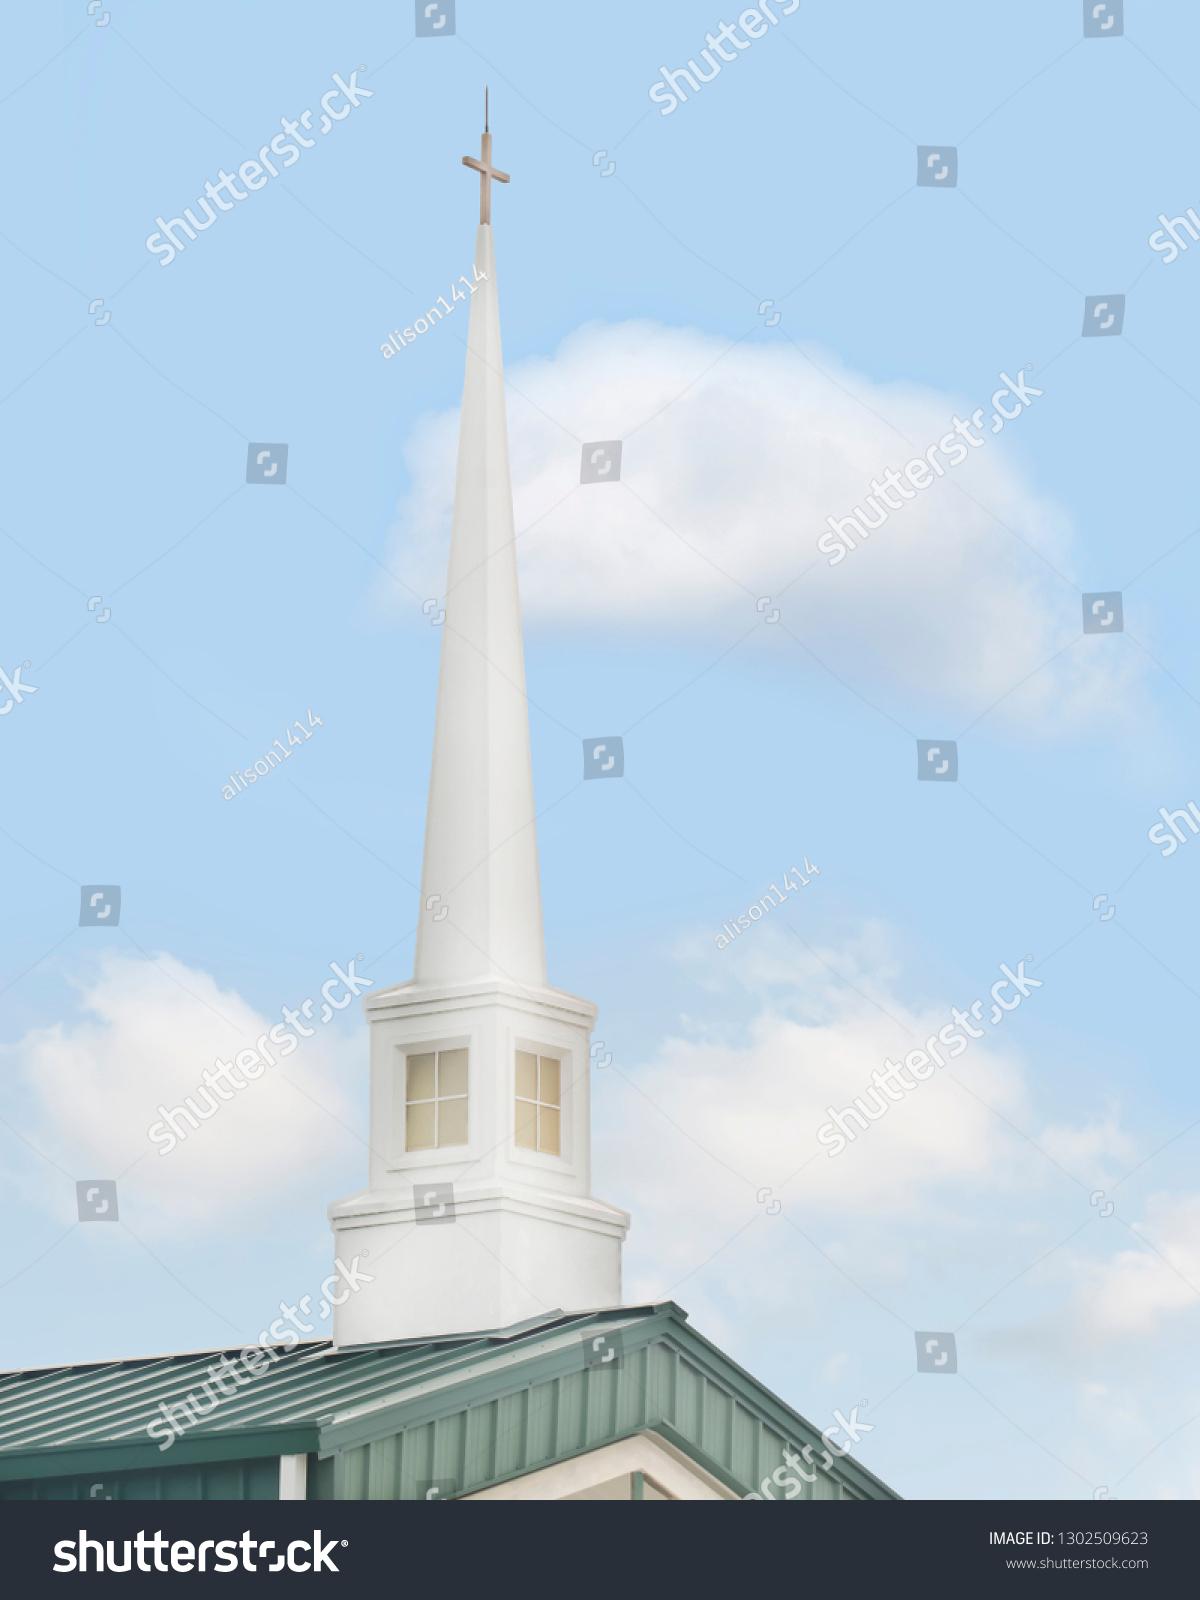 stock-photo-church-steeple-against-a-blu